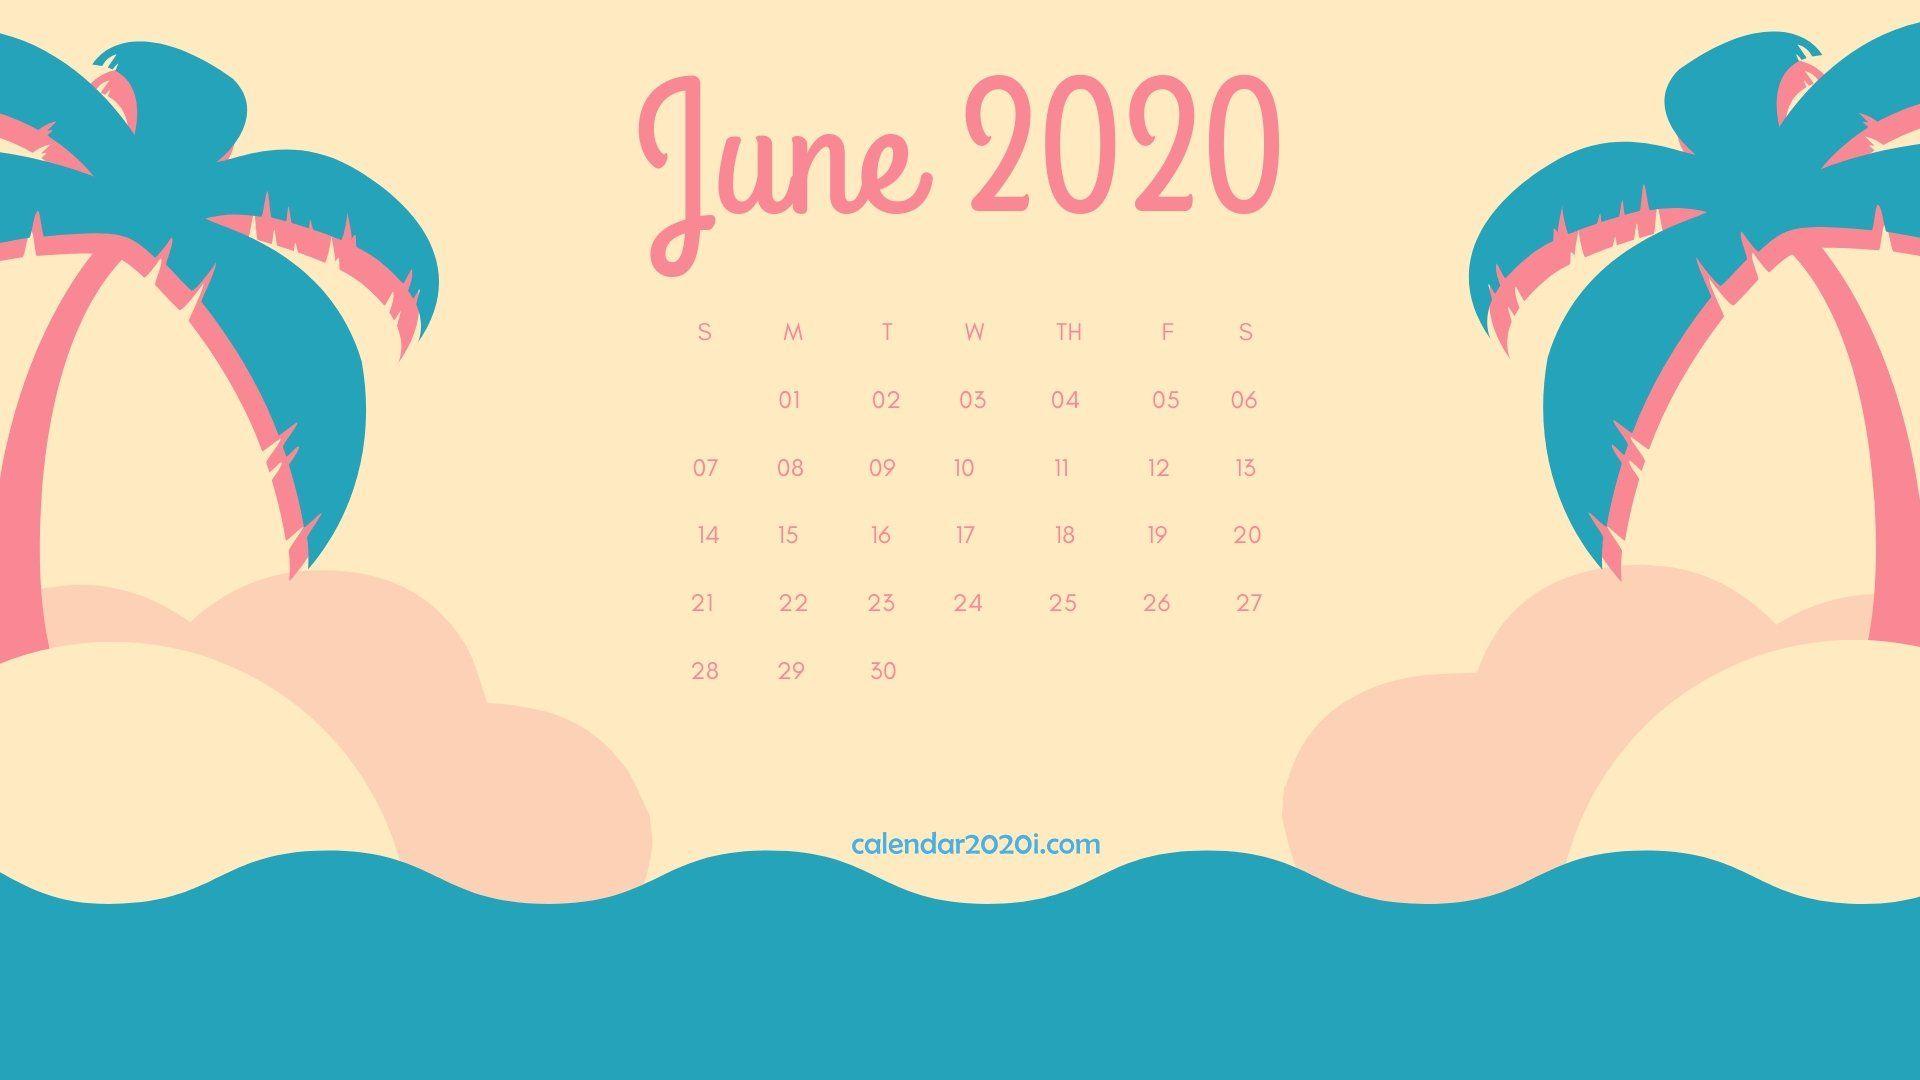 June 2020 Calendar Desktop Wallpaper printable calendar 1920x1080